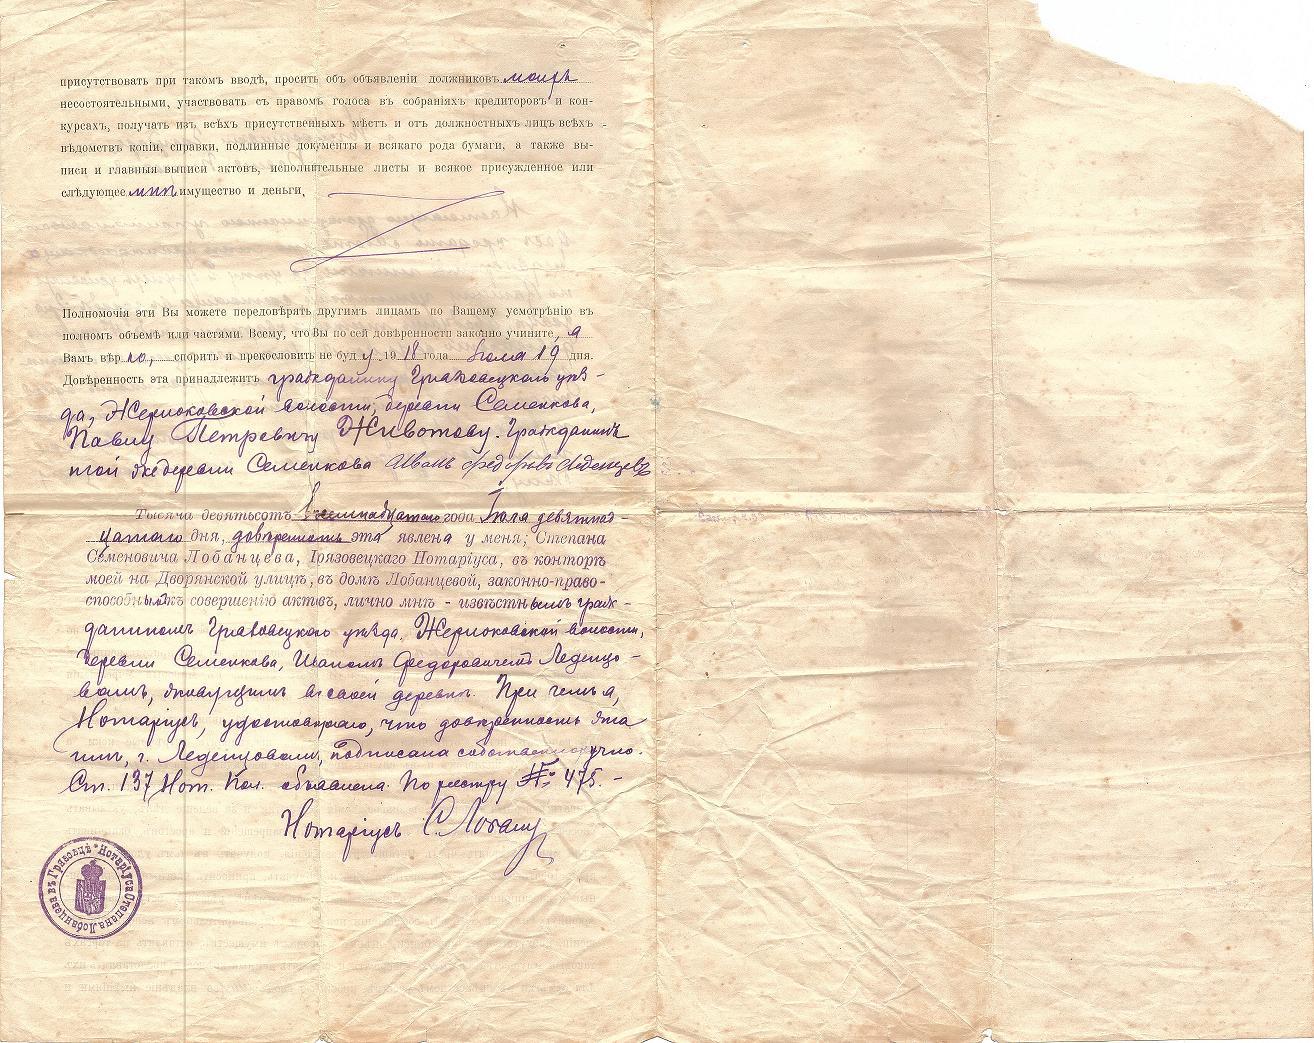 грязовец нотариус степан лобанцев 1918 год